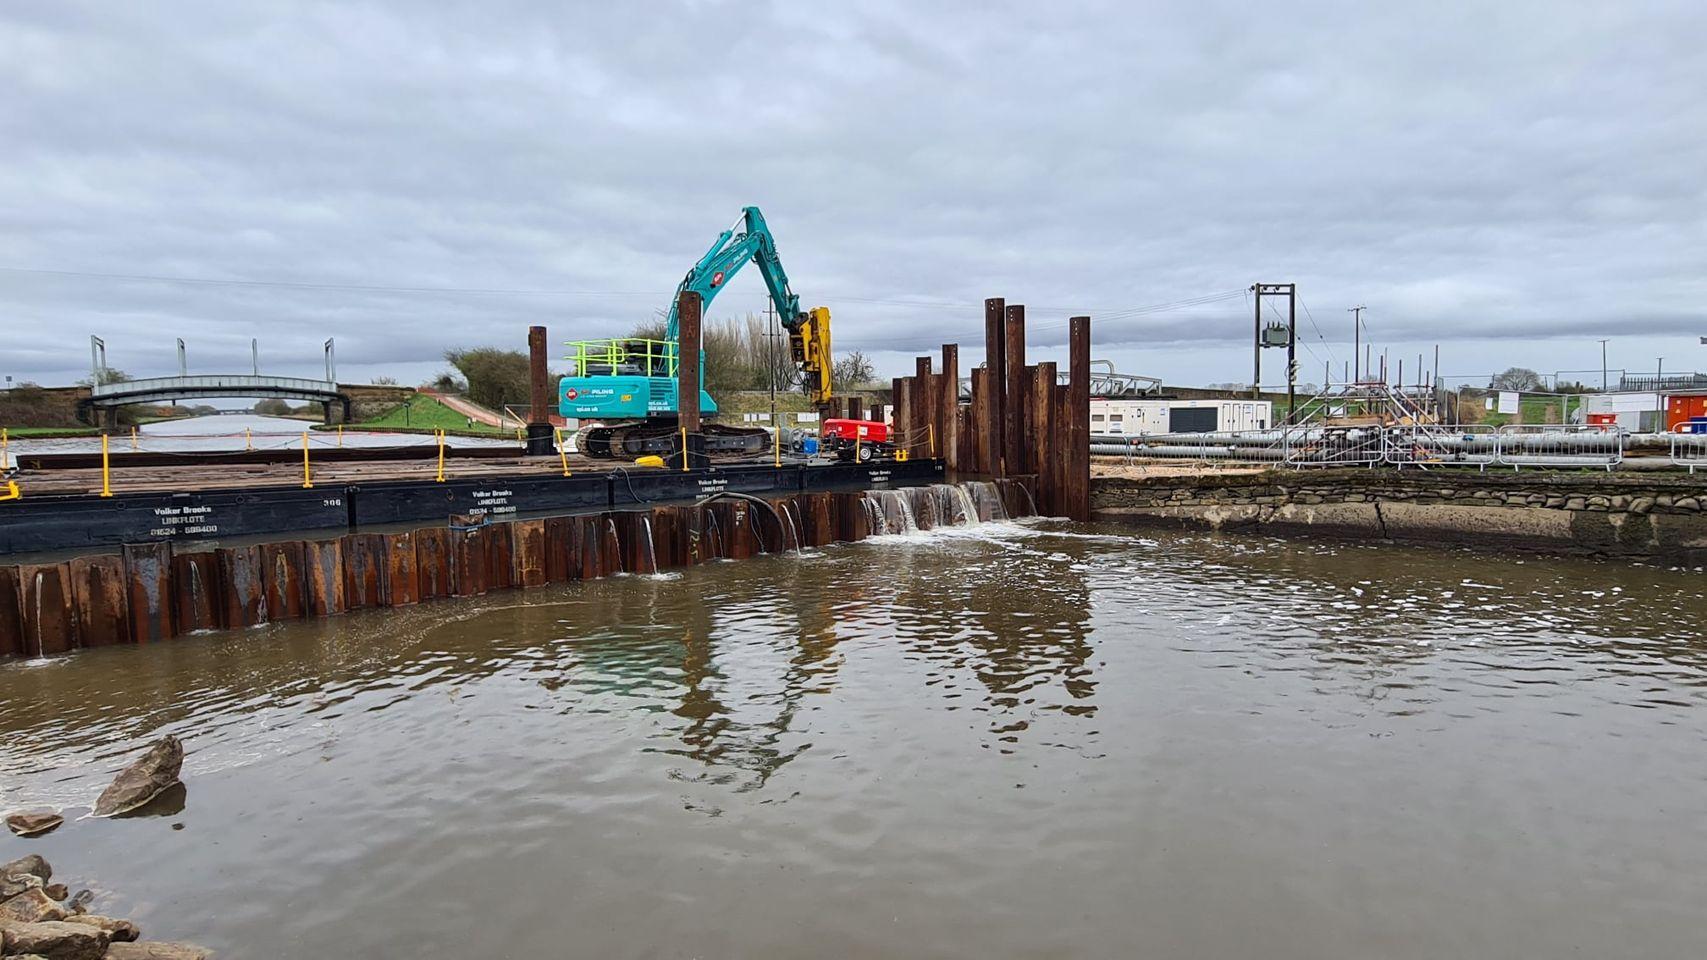 Aire and Calder Canal Breach Update